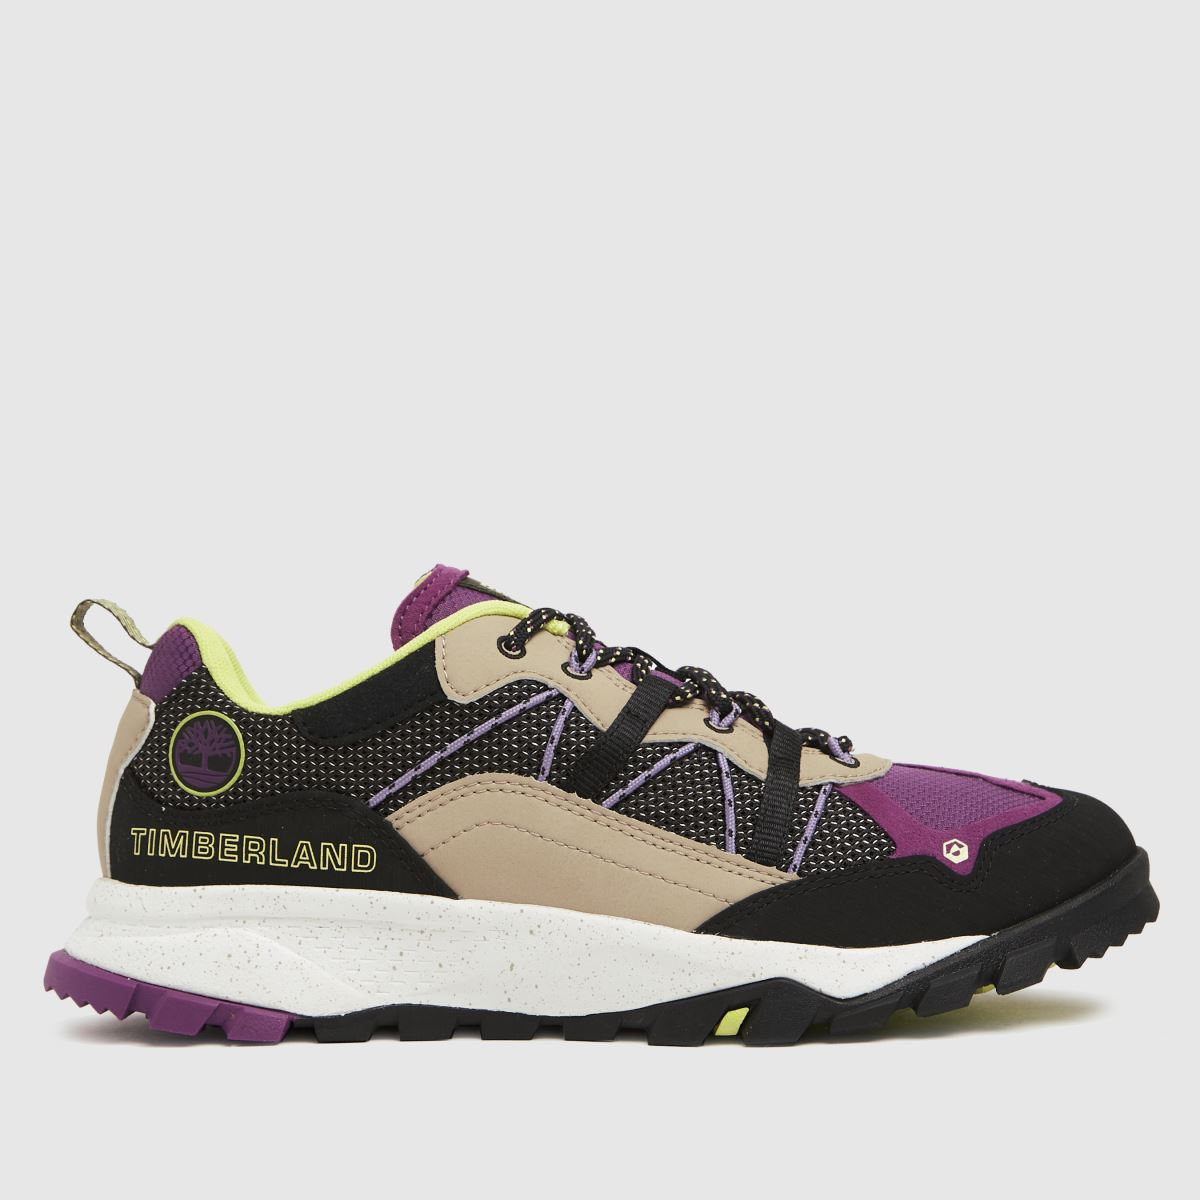 Timberland Black & Purple Garrison Low Trainers